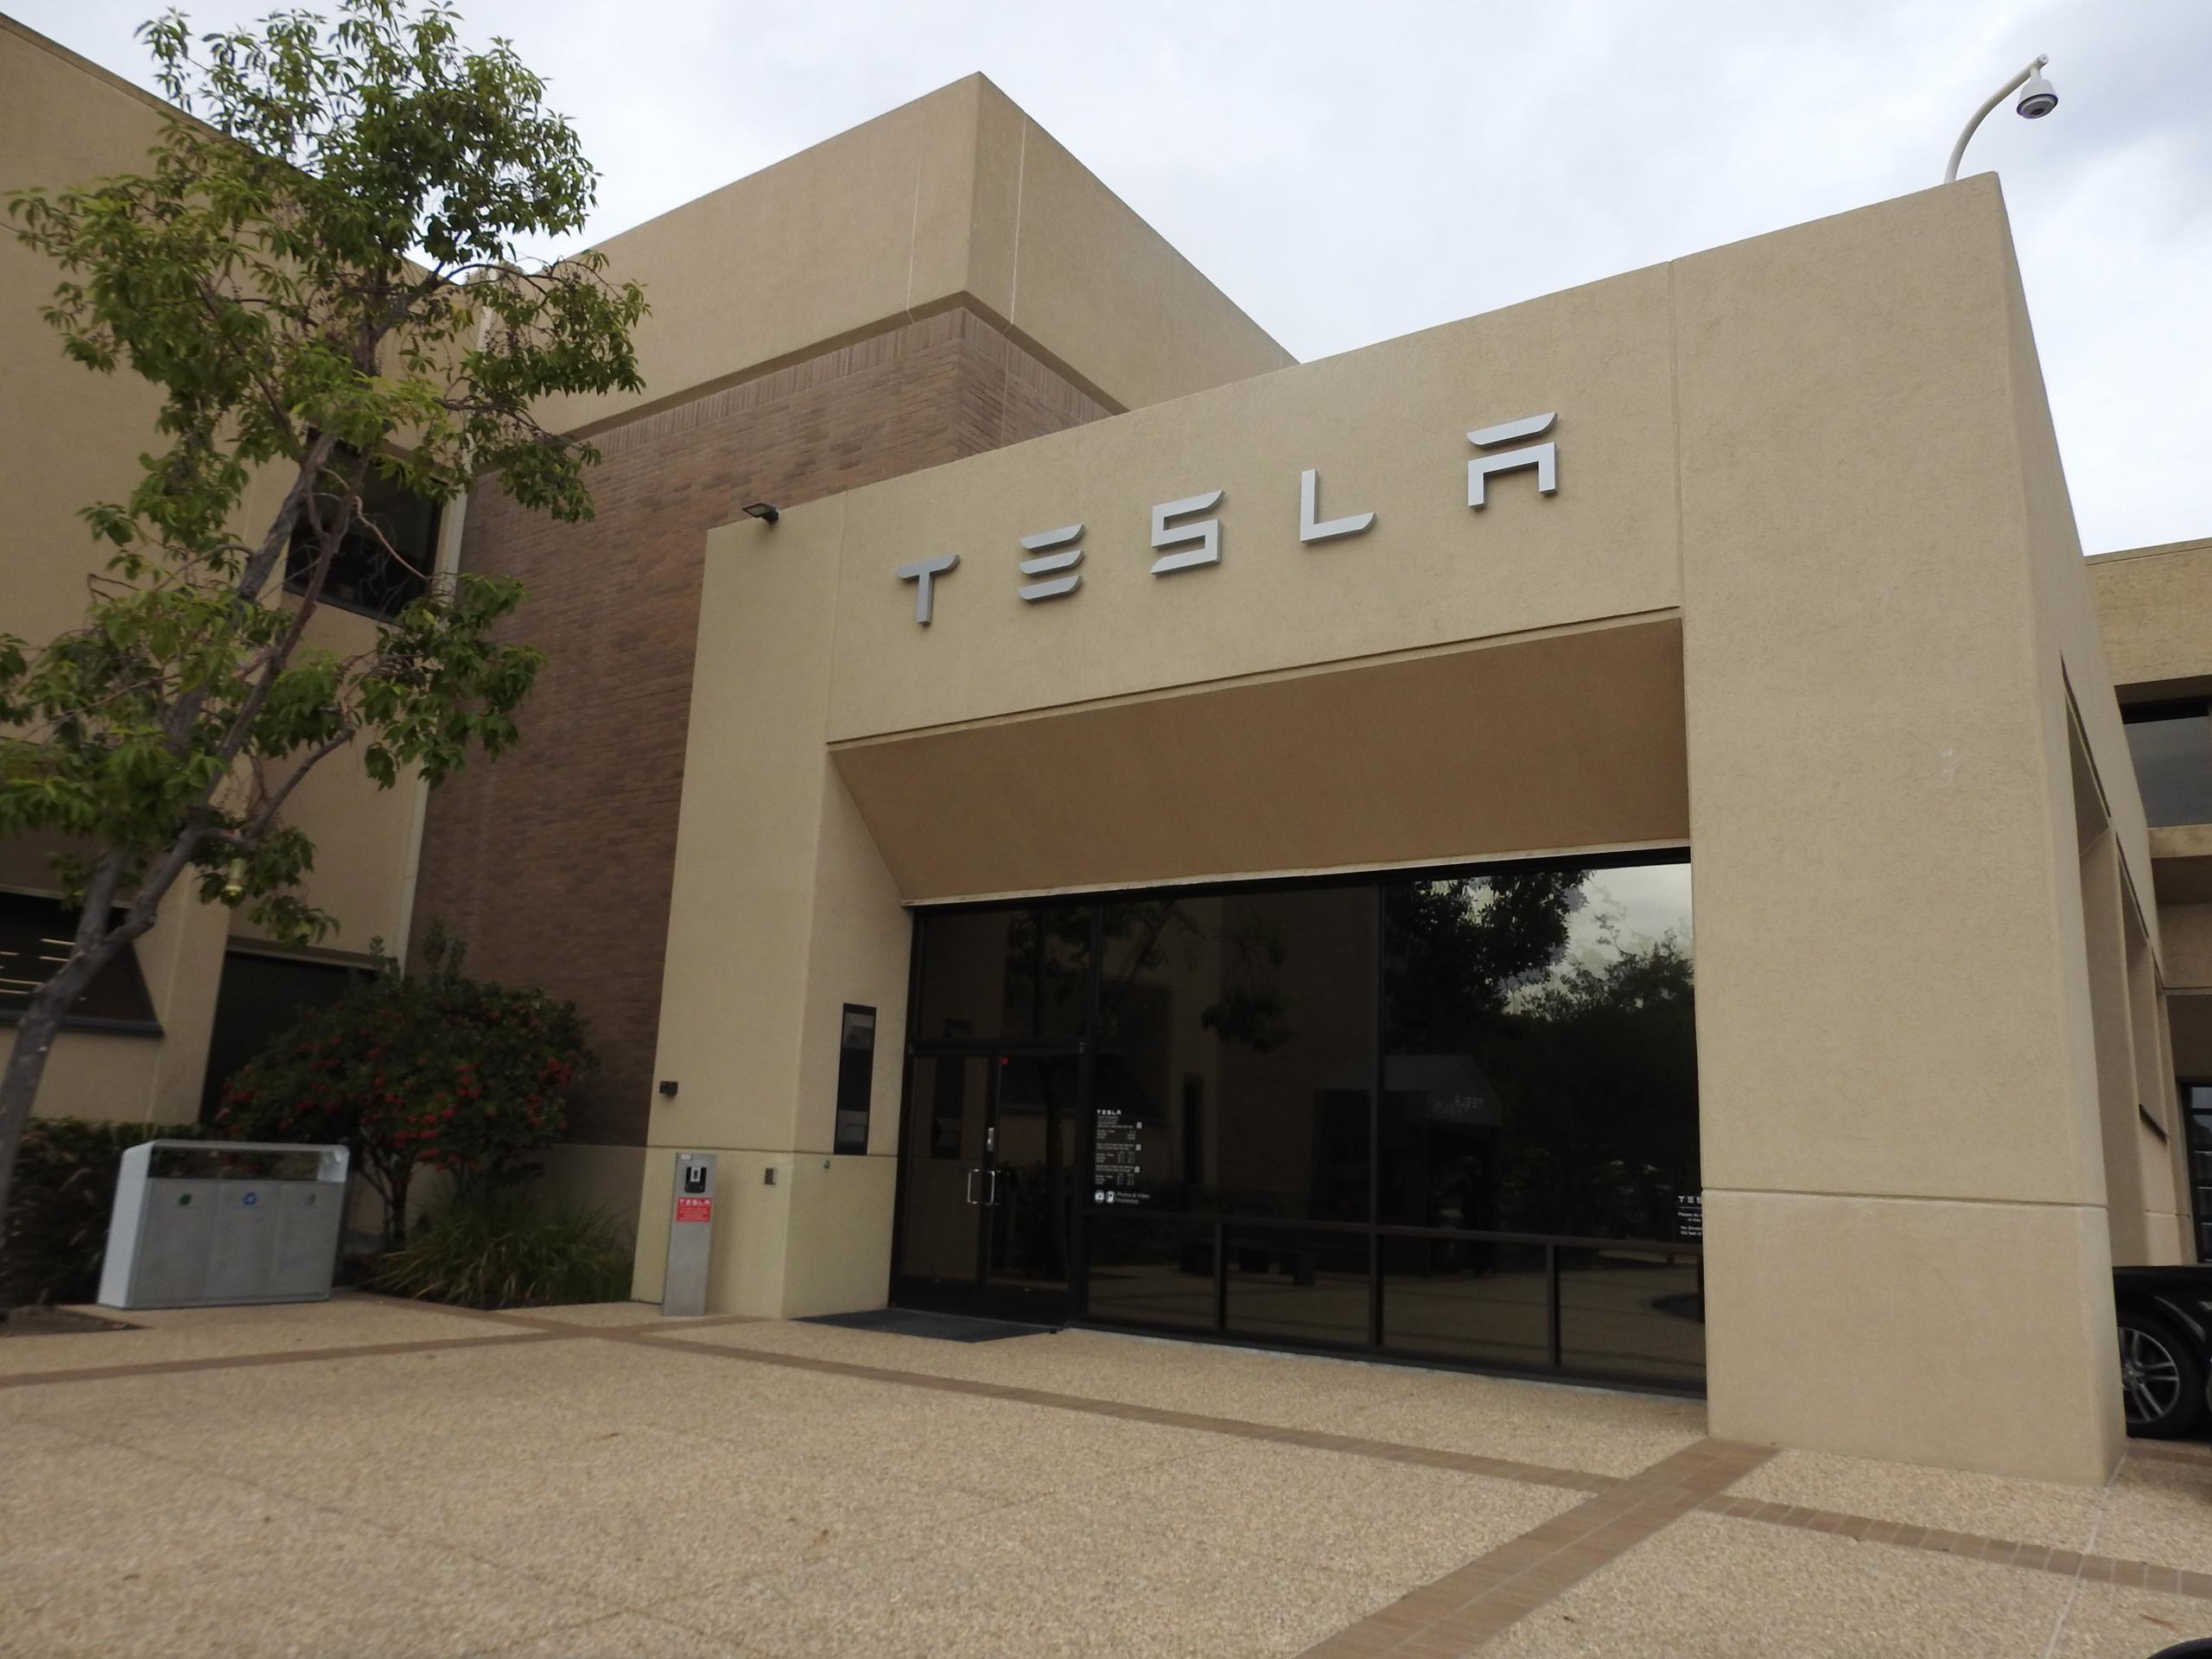 Tesla's corporate headquarters in Palo Alto, California.